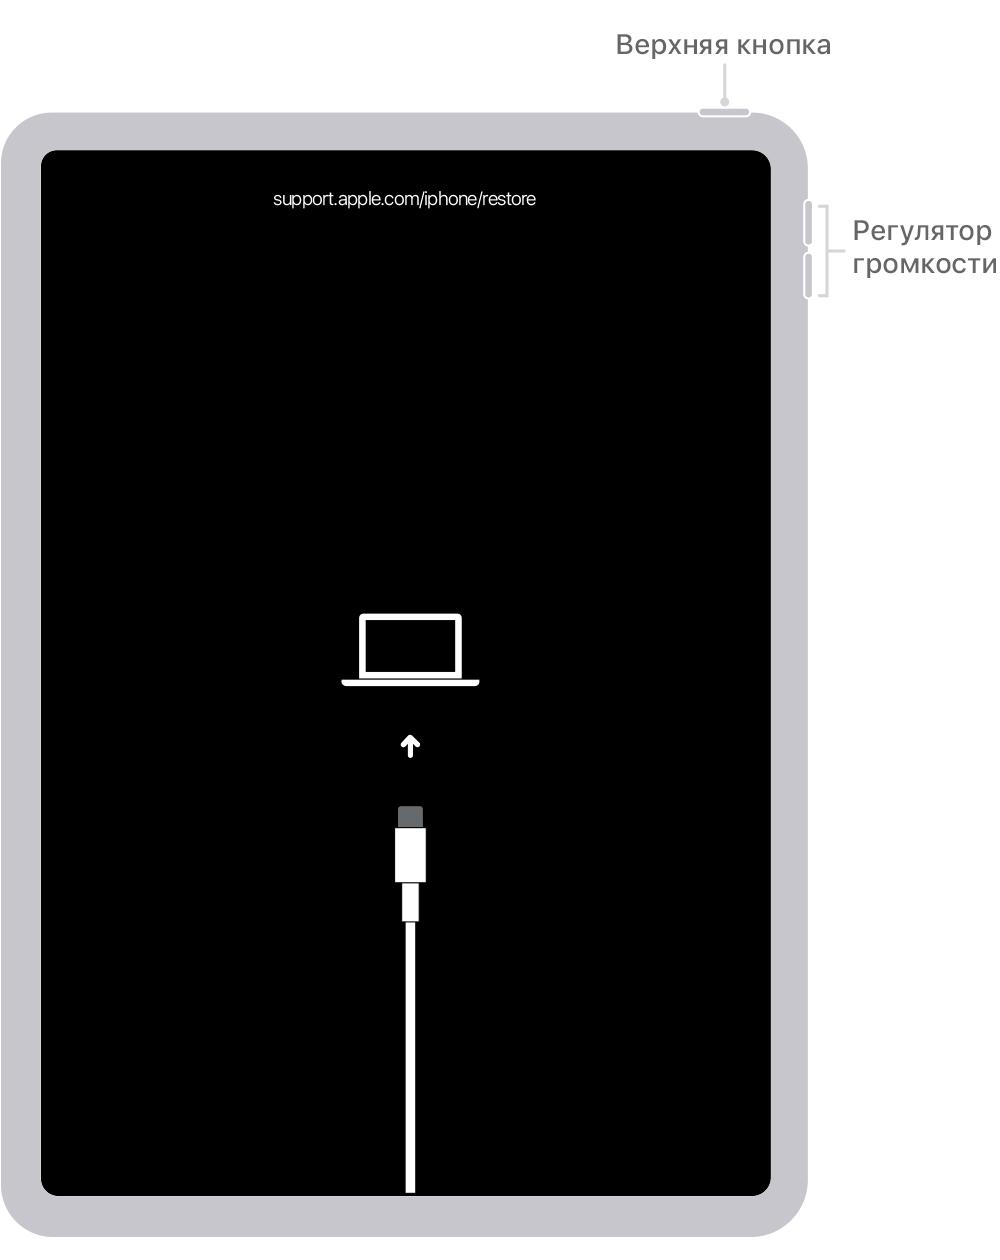 ipad-pro-remove-passcode-tech-spec.png